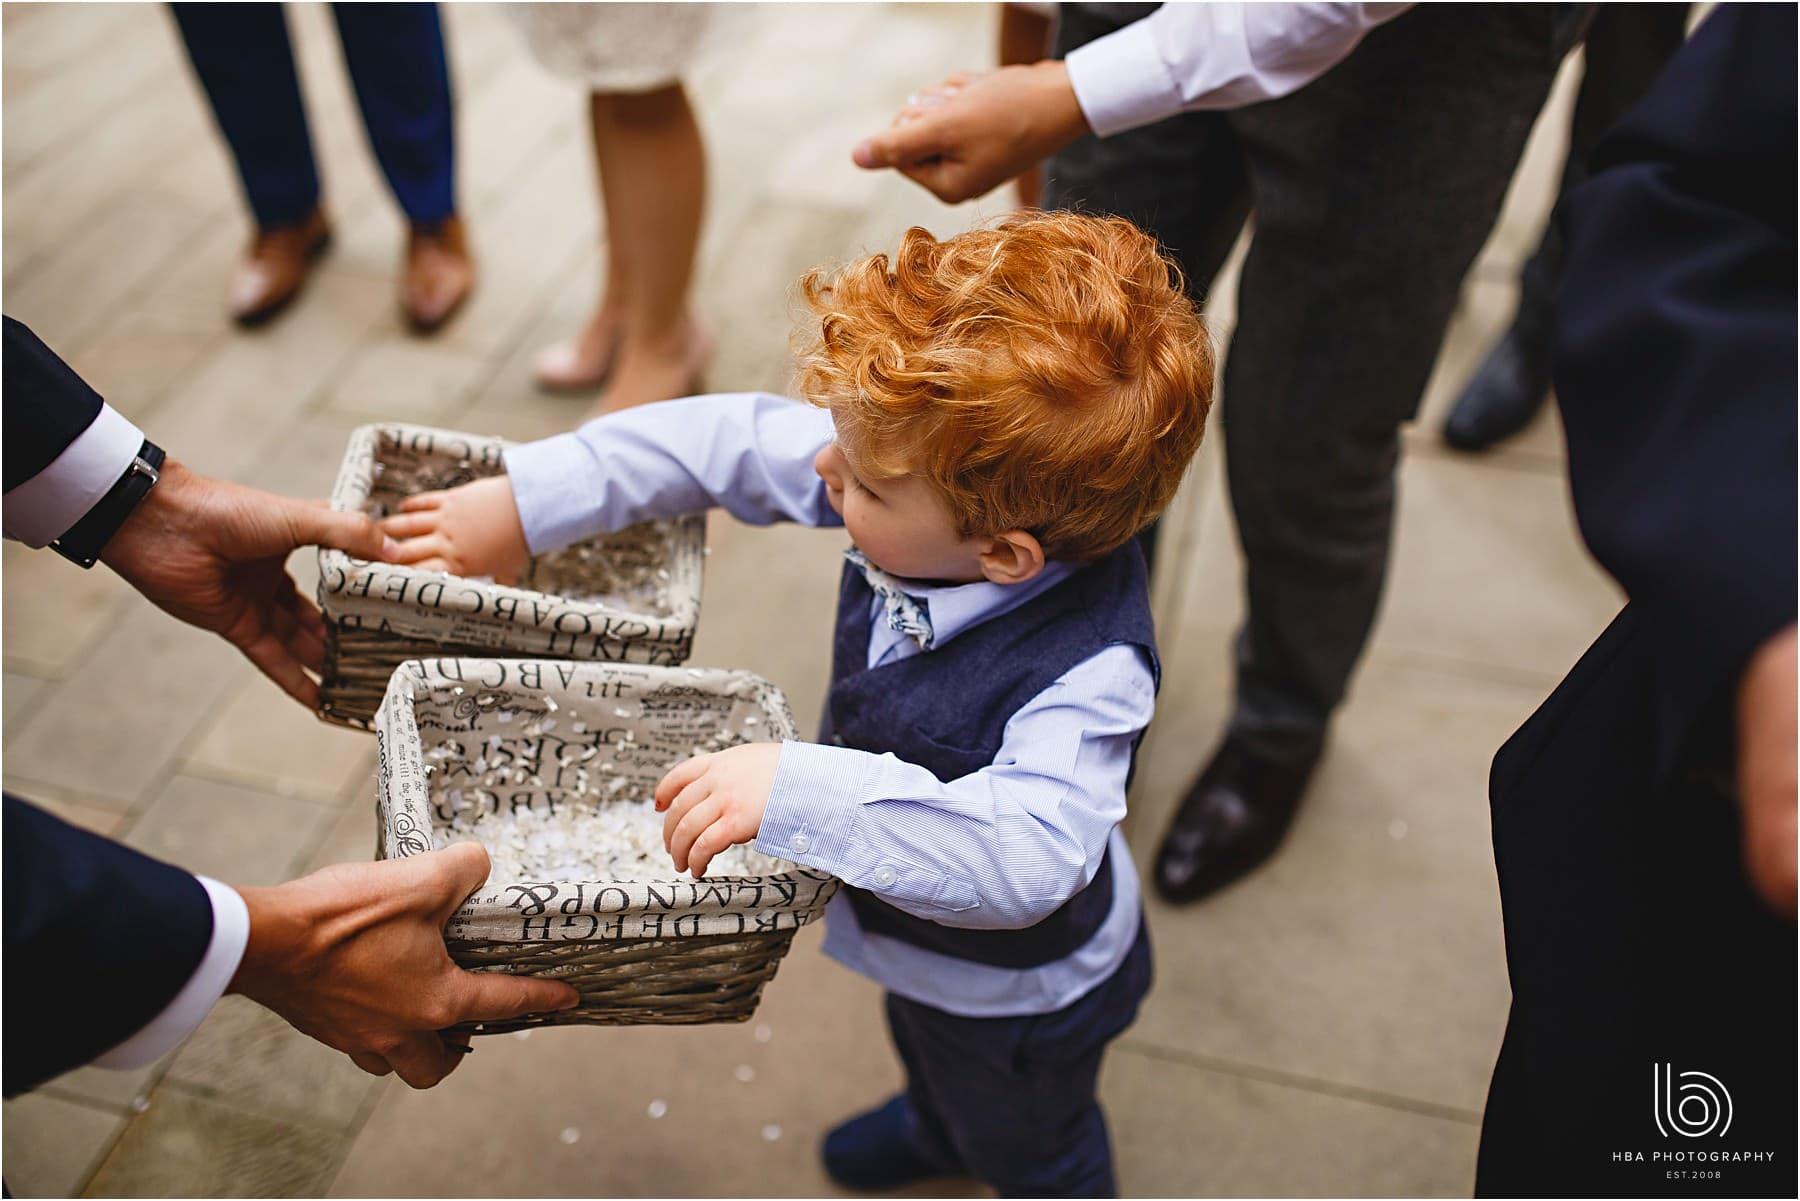 a little boy grabbing confetti